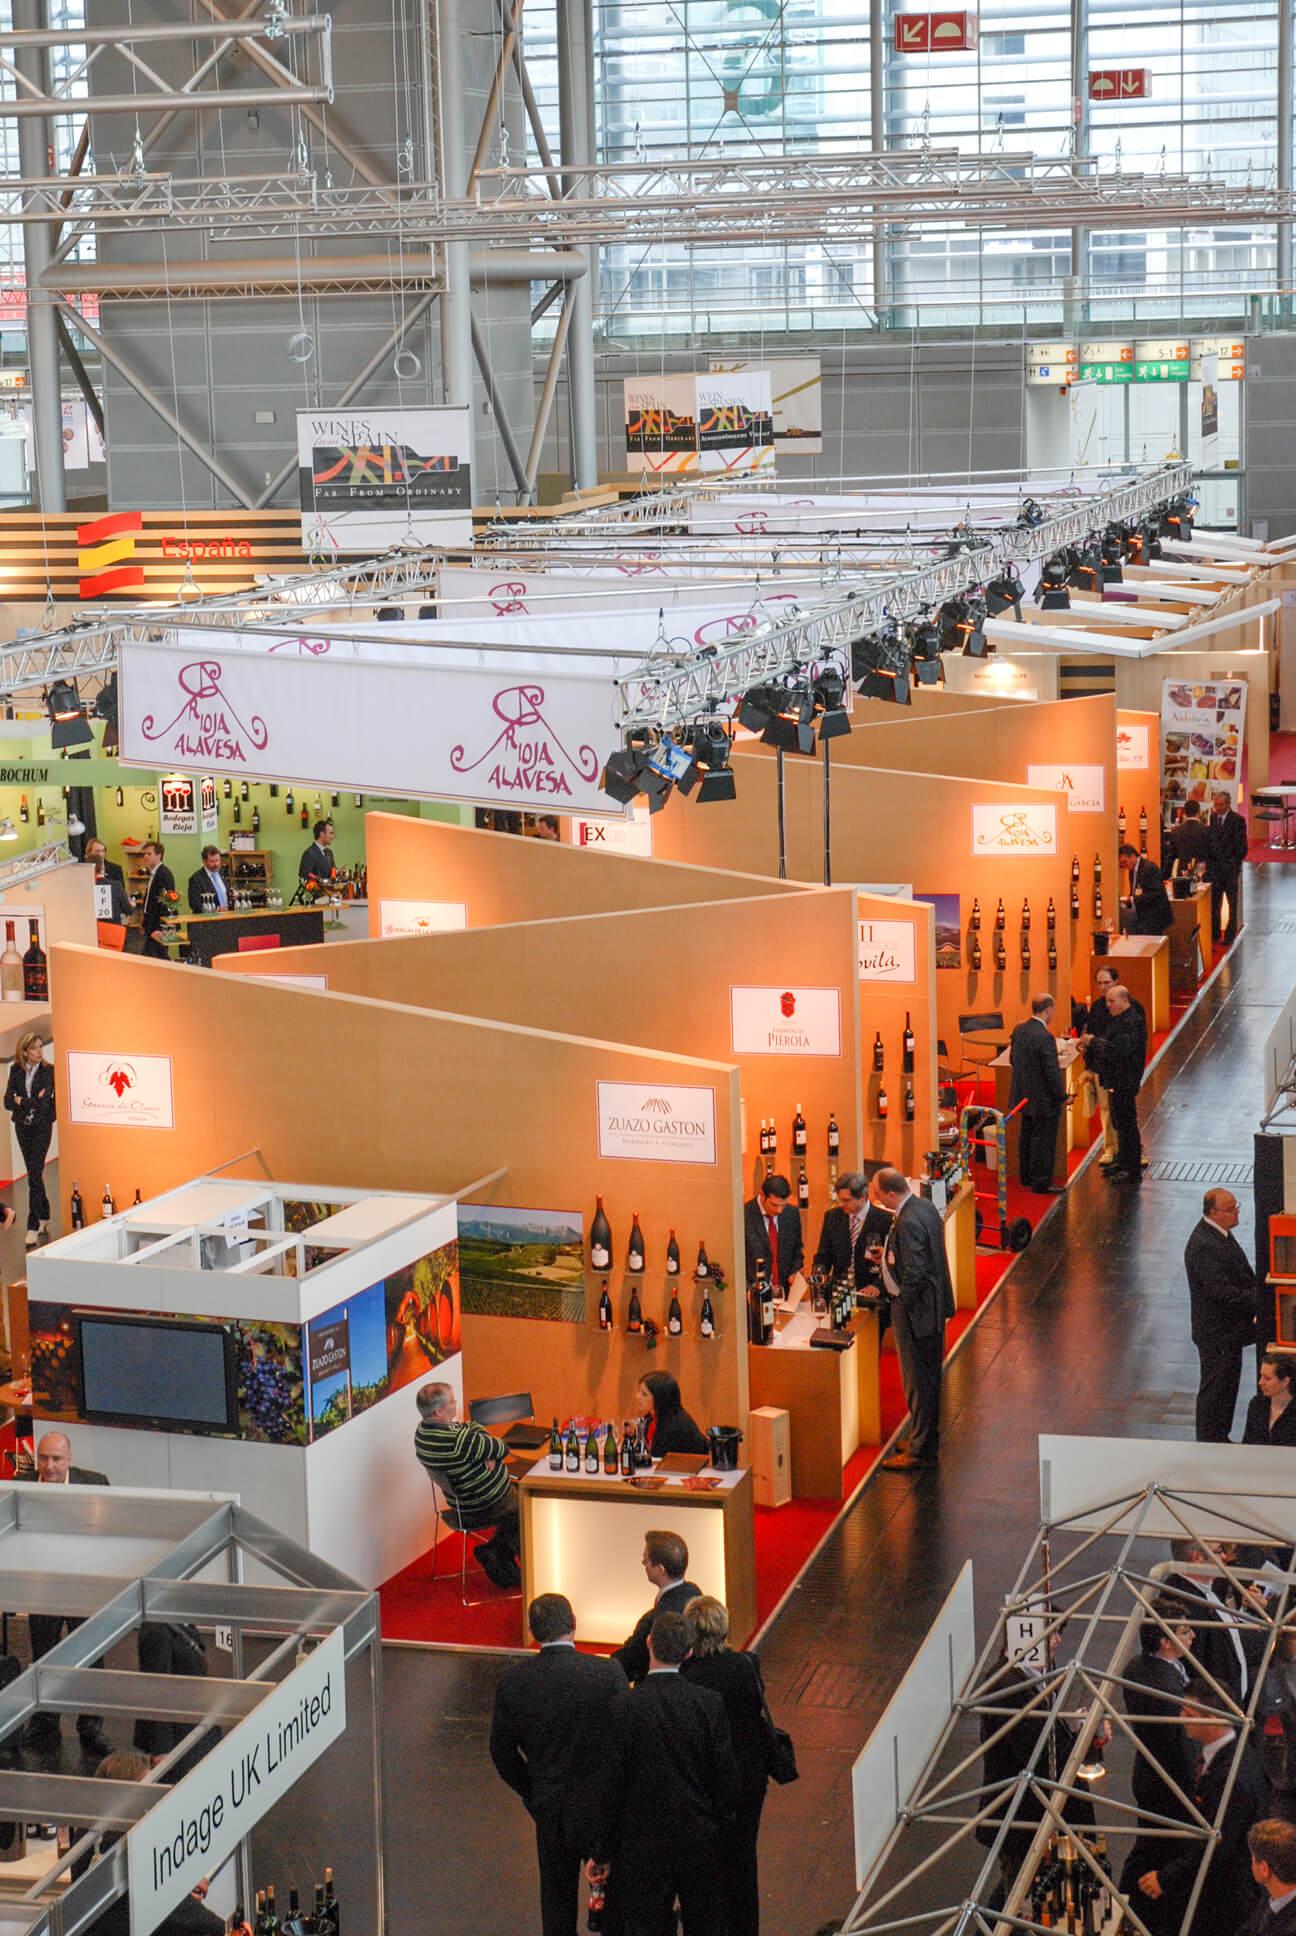 Anka Werbung - Messebau Bremen - Messebau (Rioja Alavesa ProWein)